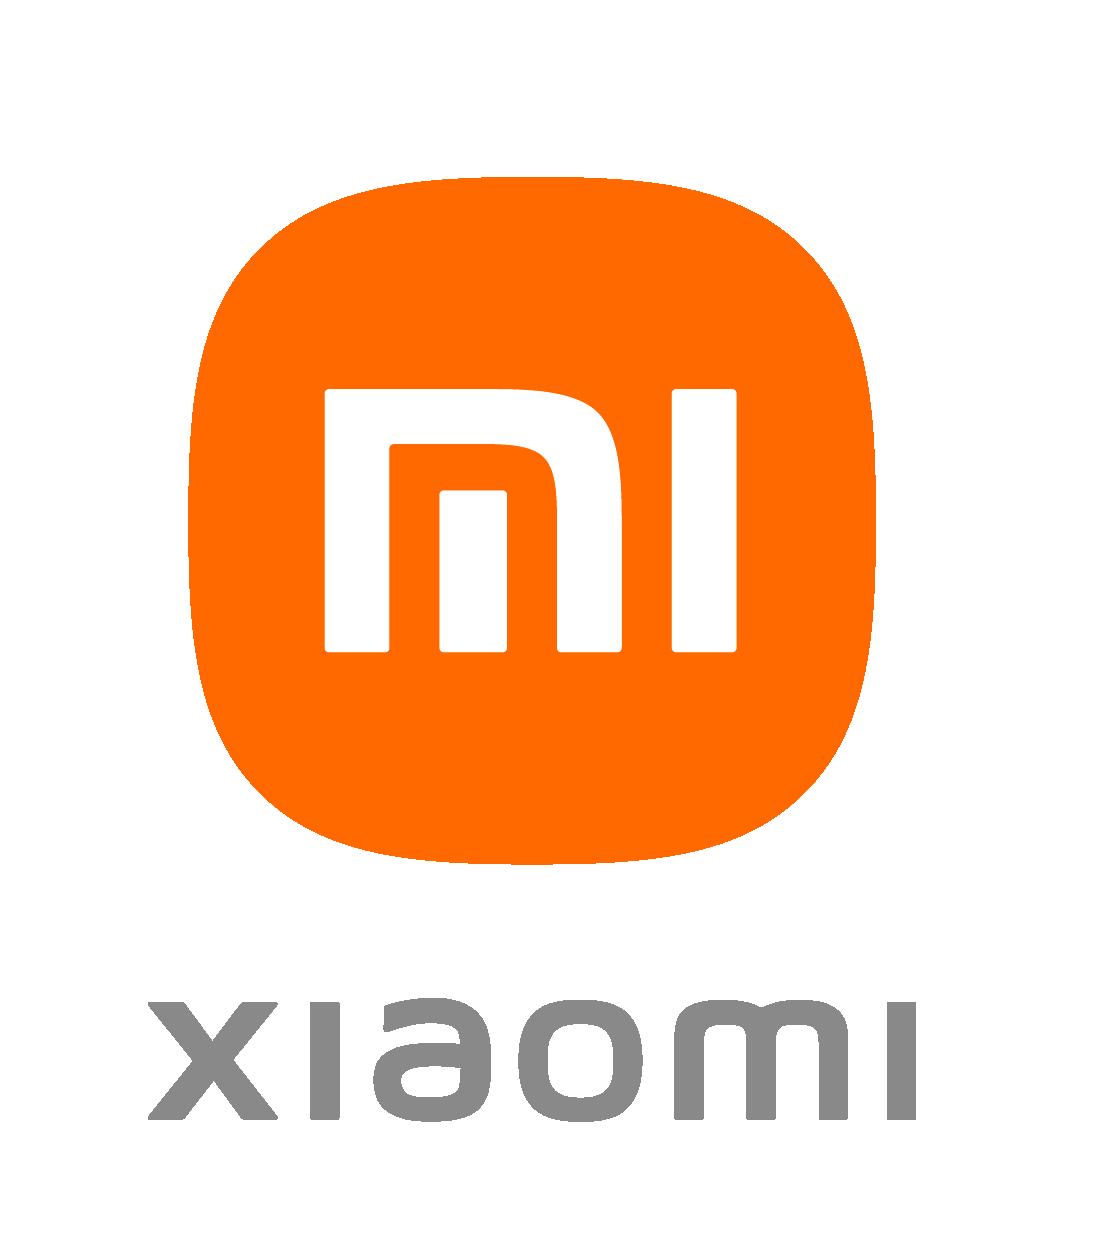 XIAOMI Башкортостан